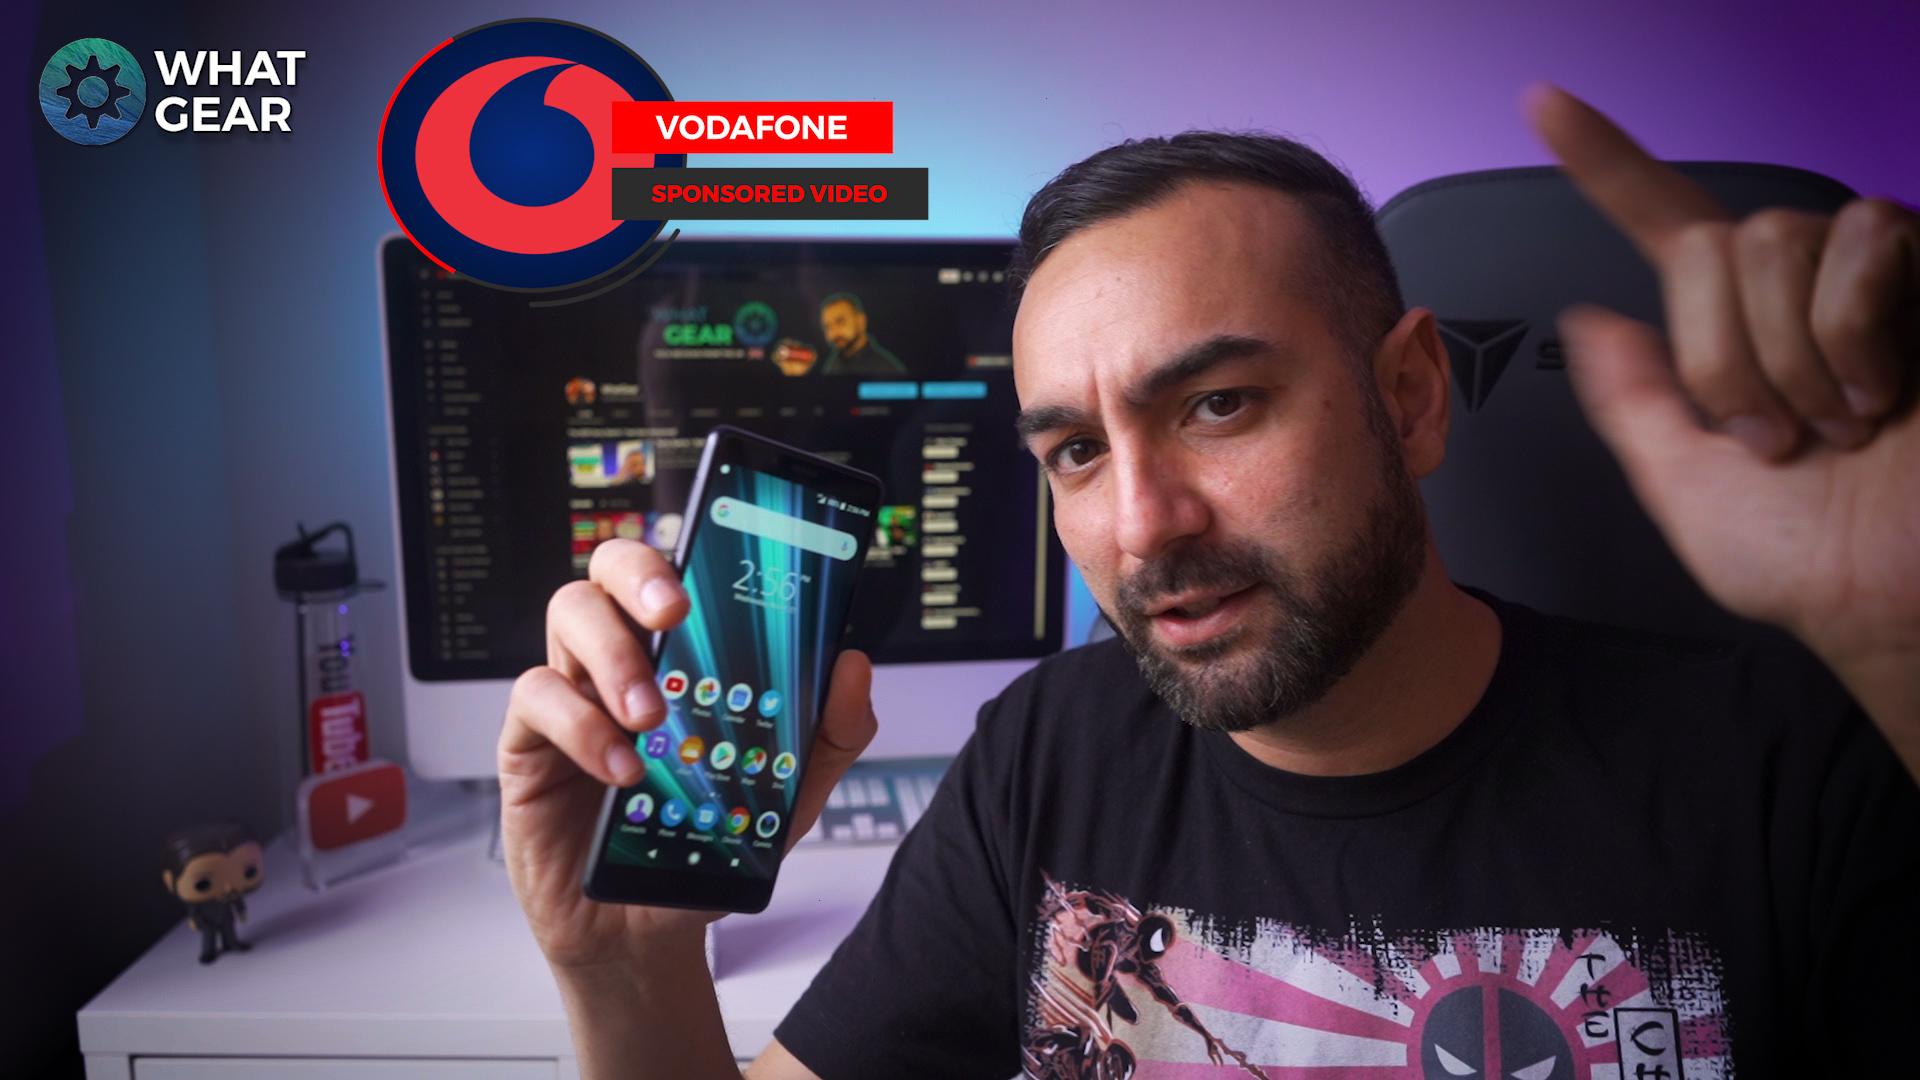 xperia l3 review 2019.jpg